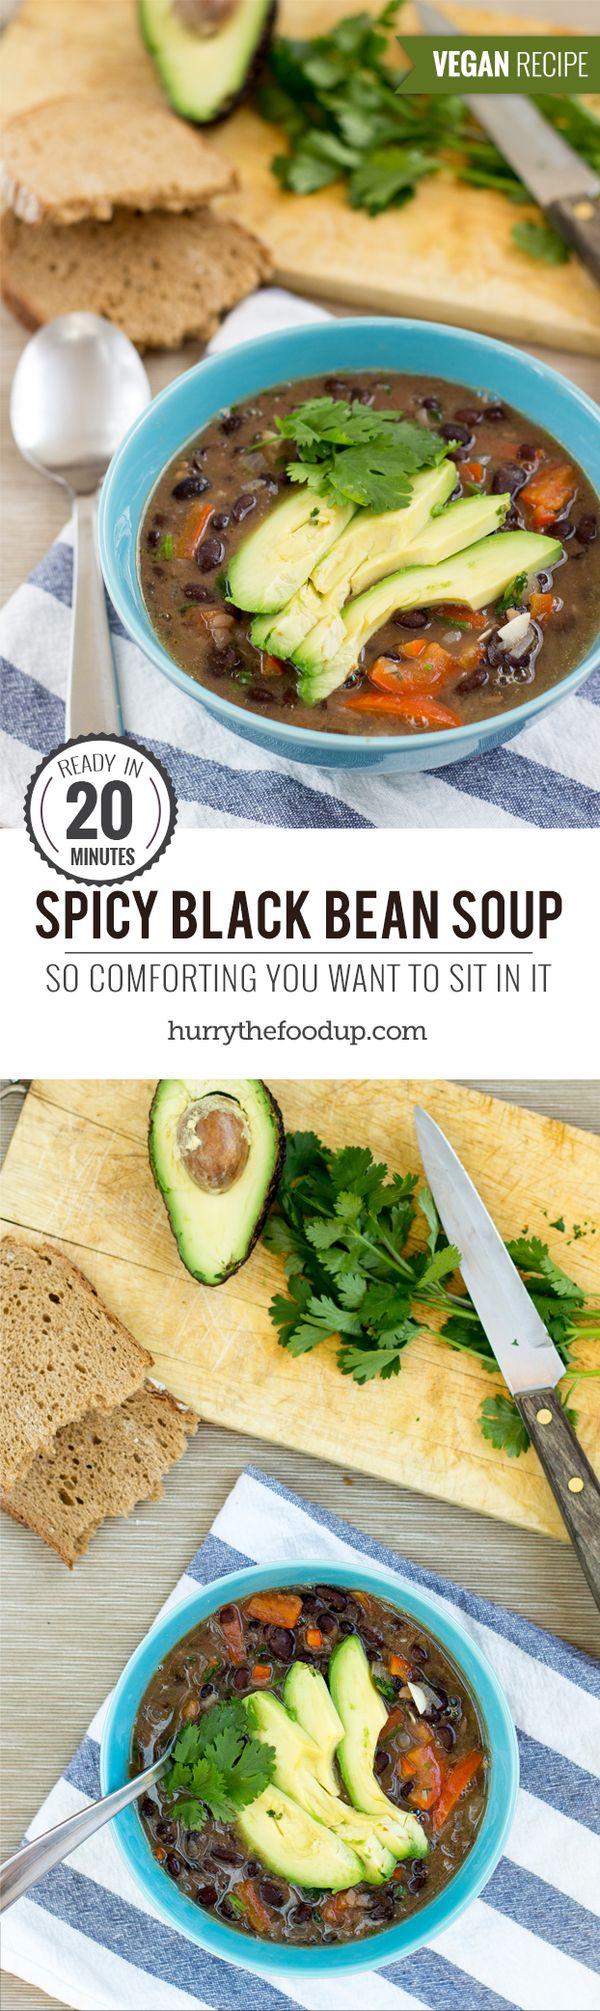 Spicy Black Bean Soup (20 Min, Vegan